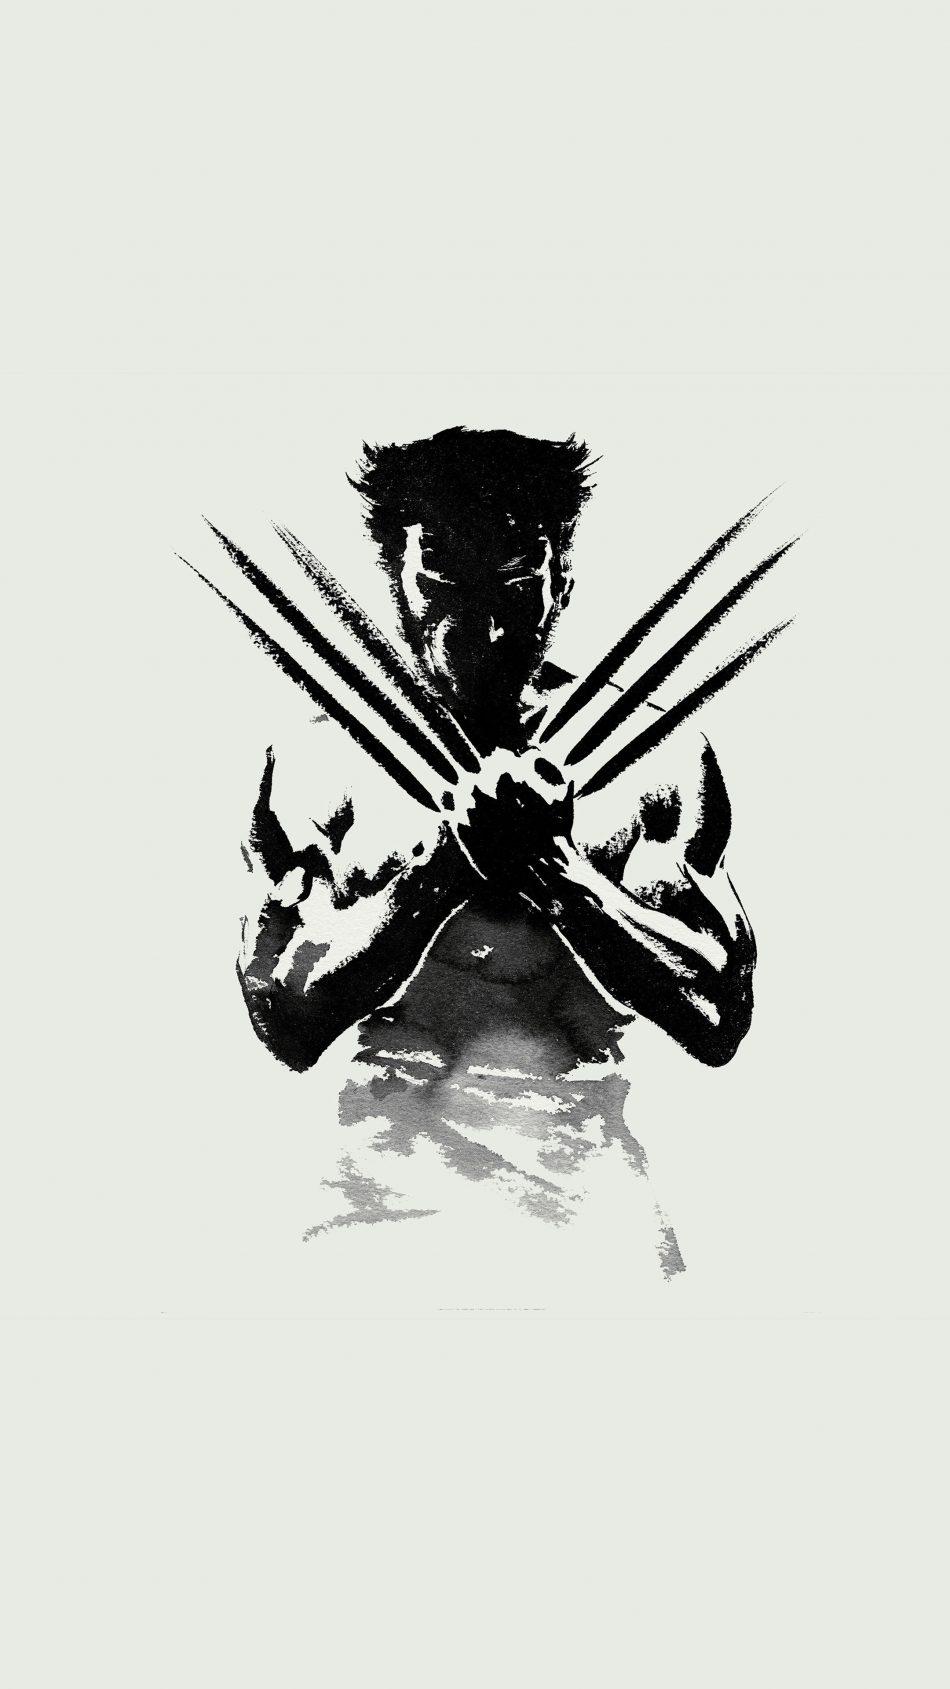 Wolverine Fan Artwork 4k Ultra Hd Mobile Wallpaper X Men Wallpaper 4k Phone 950x1689 Wallpaper Teahub Io